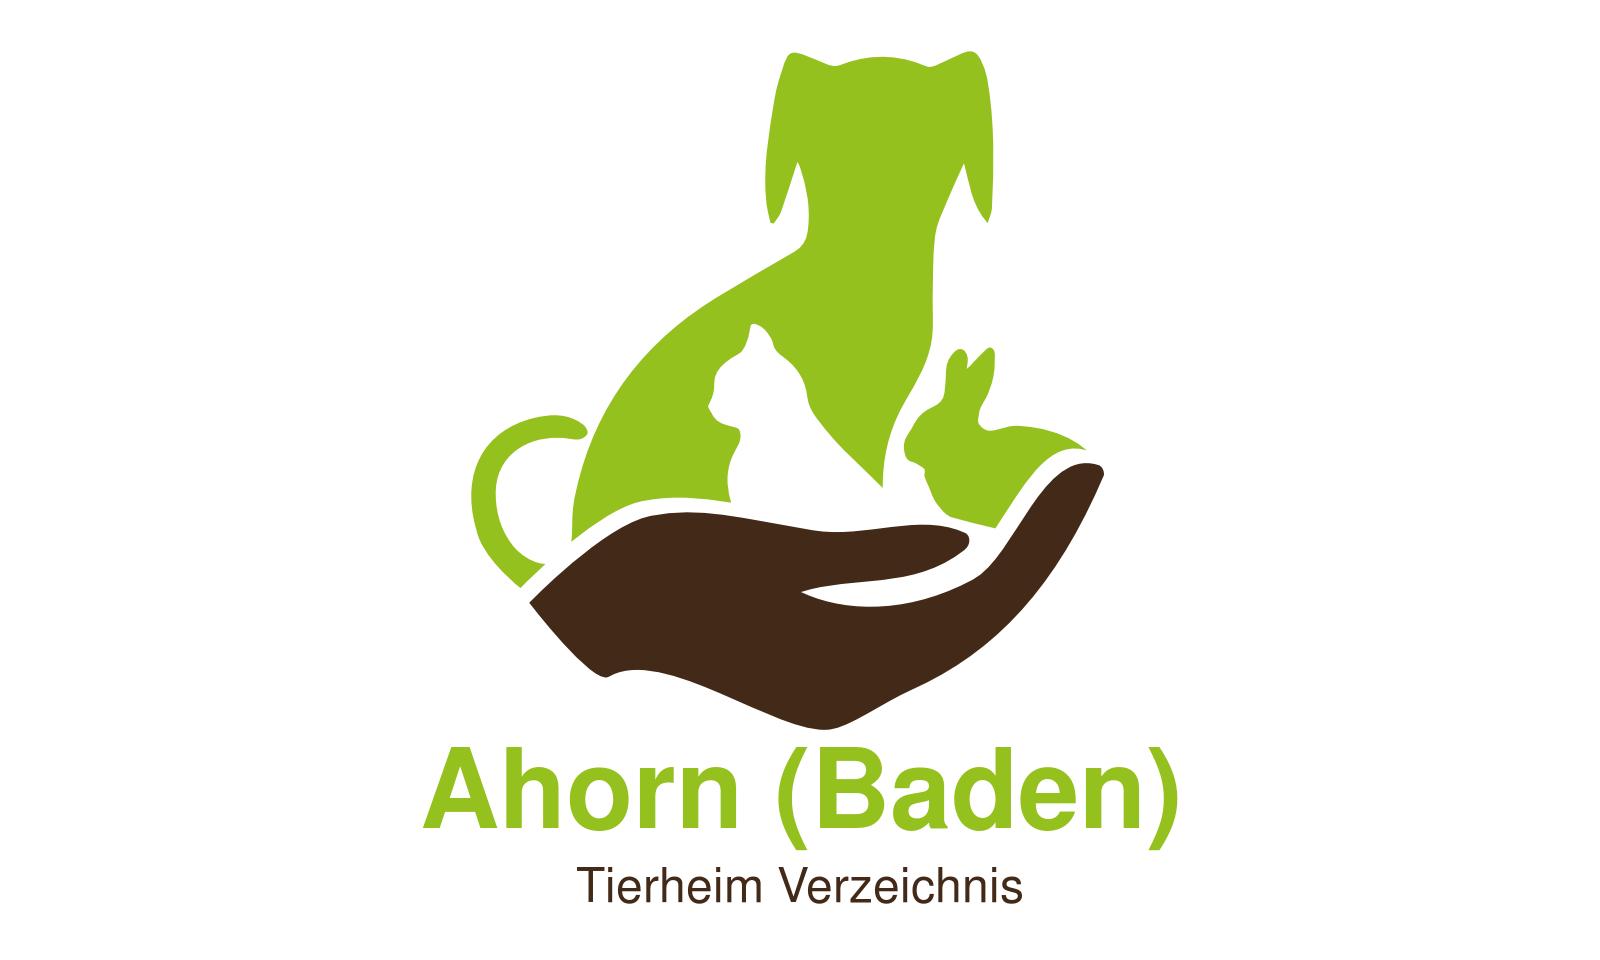 Tierheim Ahorn (Baden)